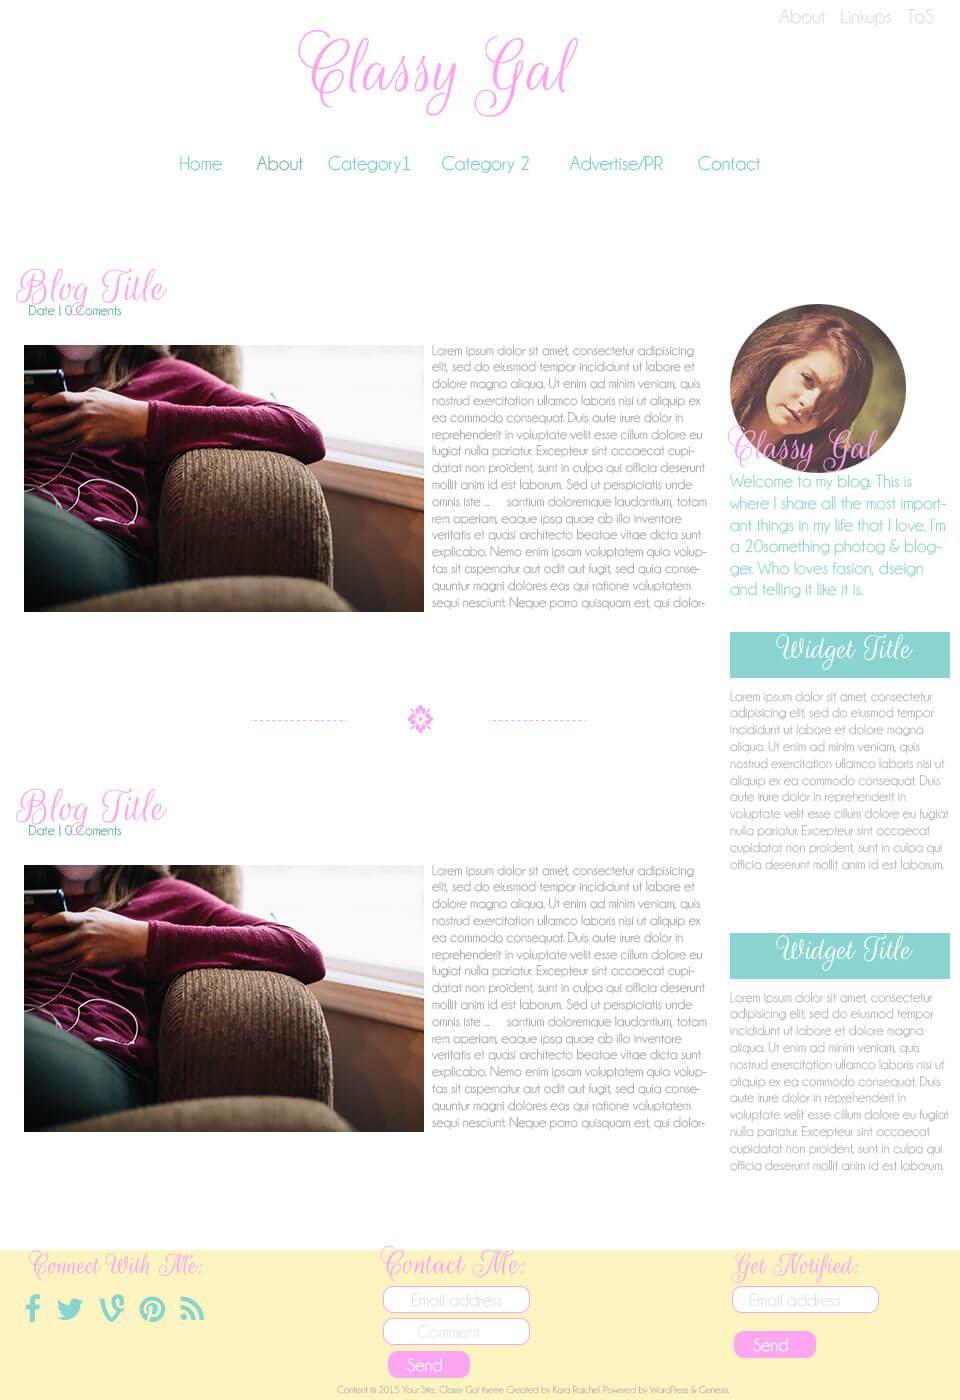 Classy Gal WordPress Theme by Kara Rajchel